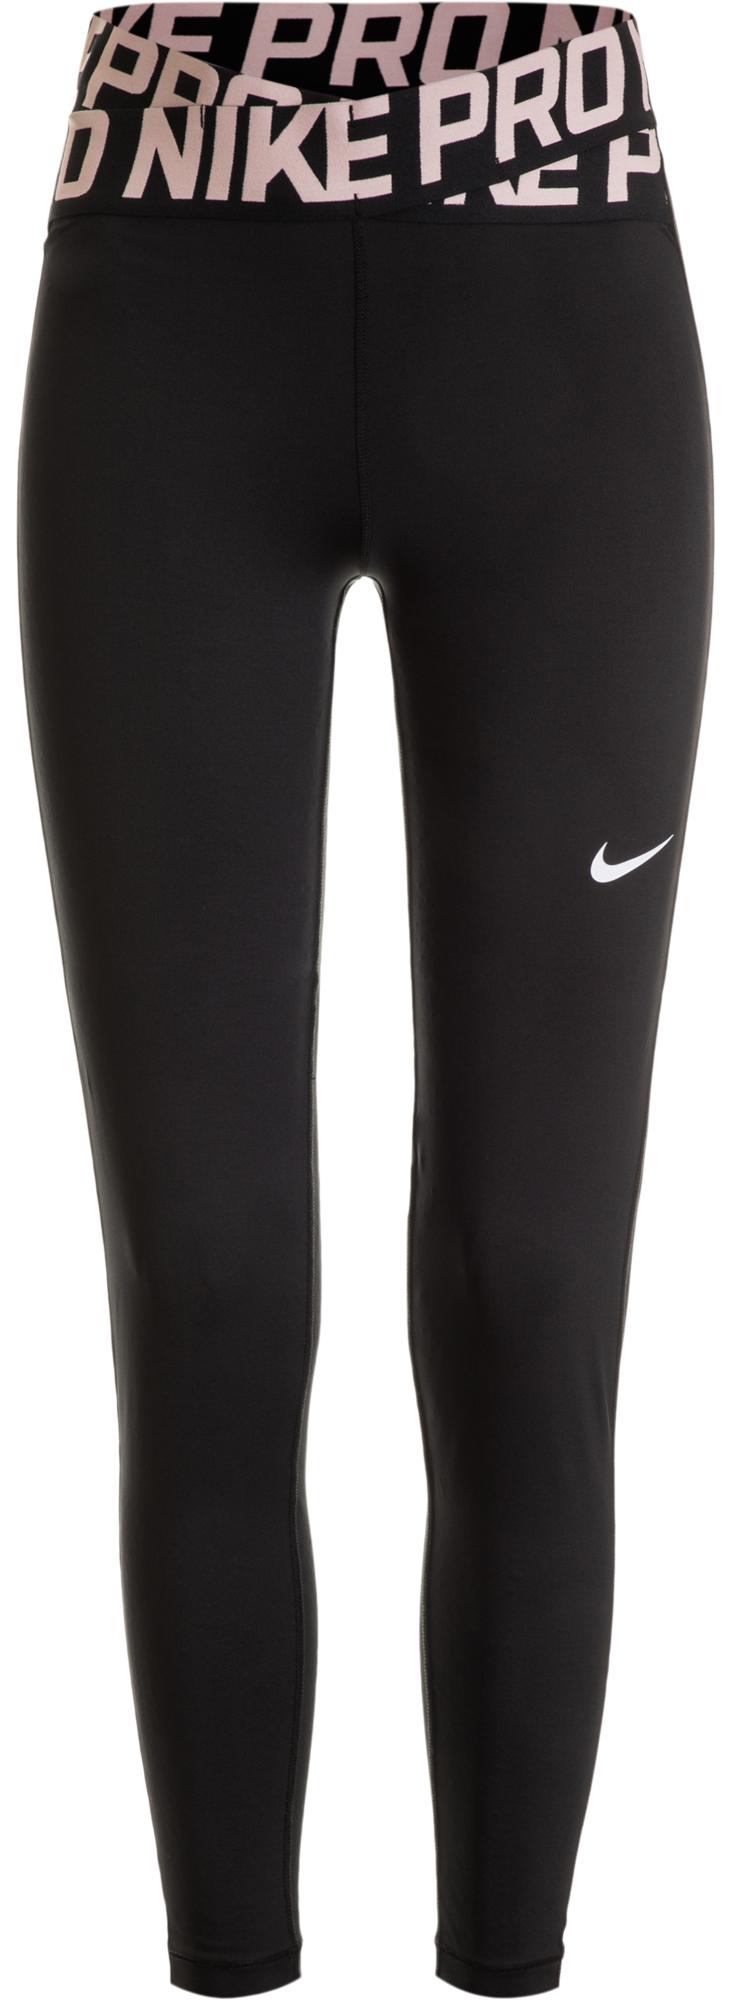 Nike Легинсы женские Nike Pro, размер 46-48 nike легинсы женские nike sculpt hyper